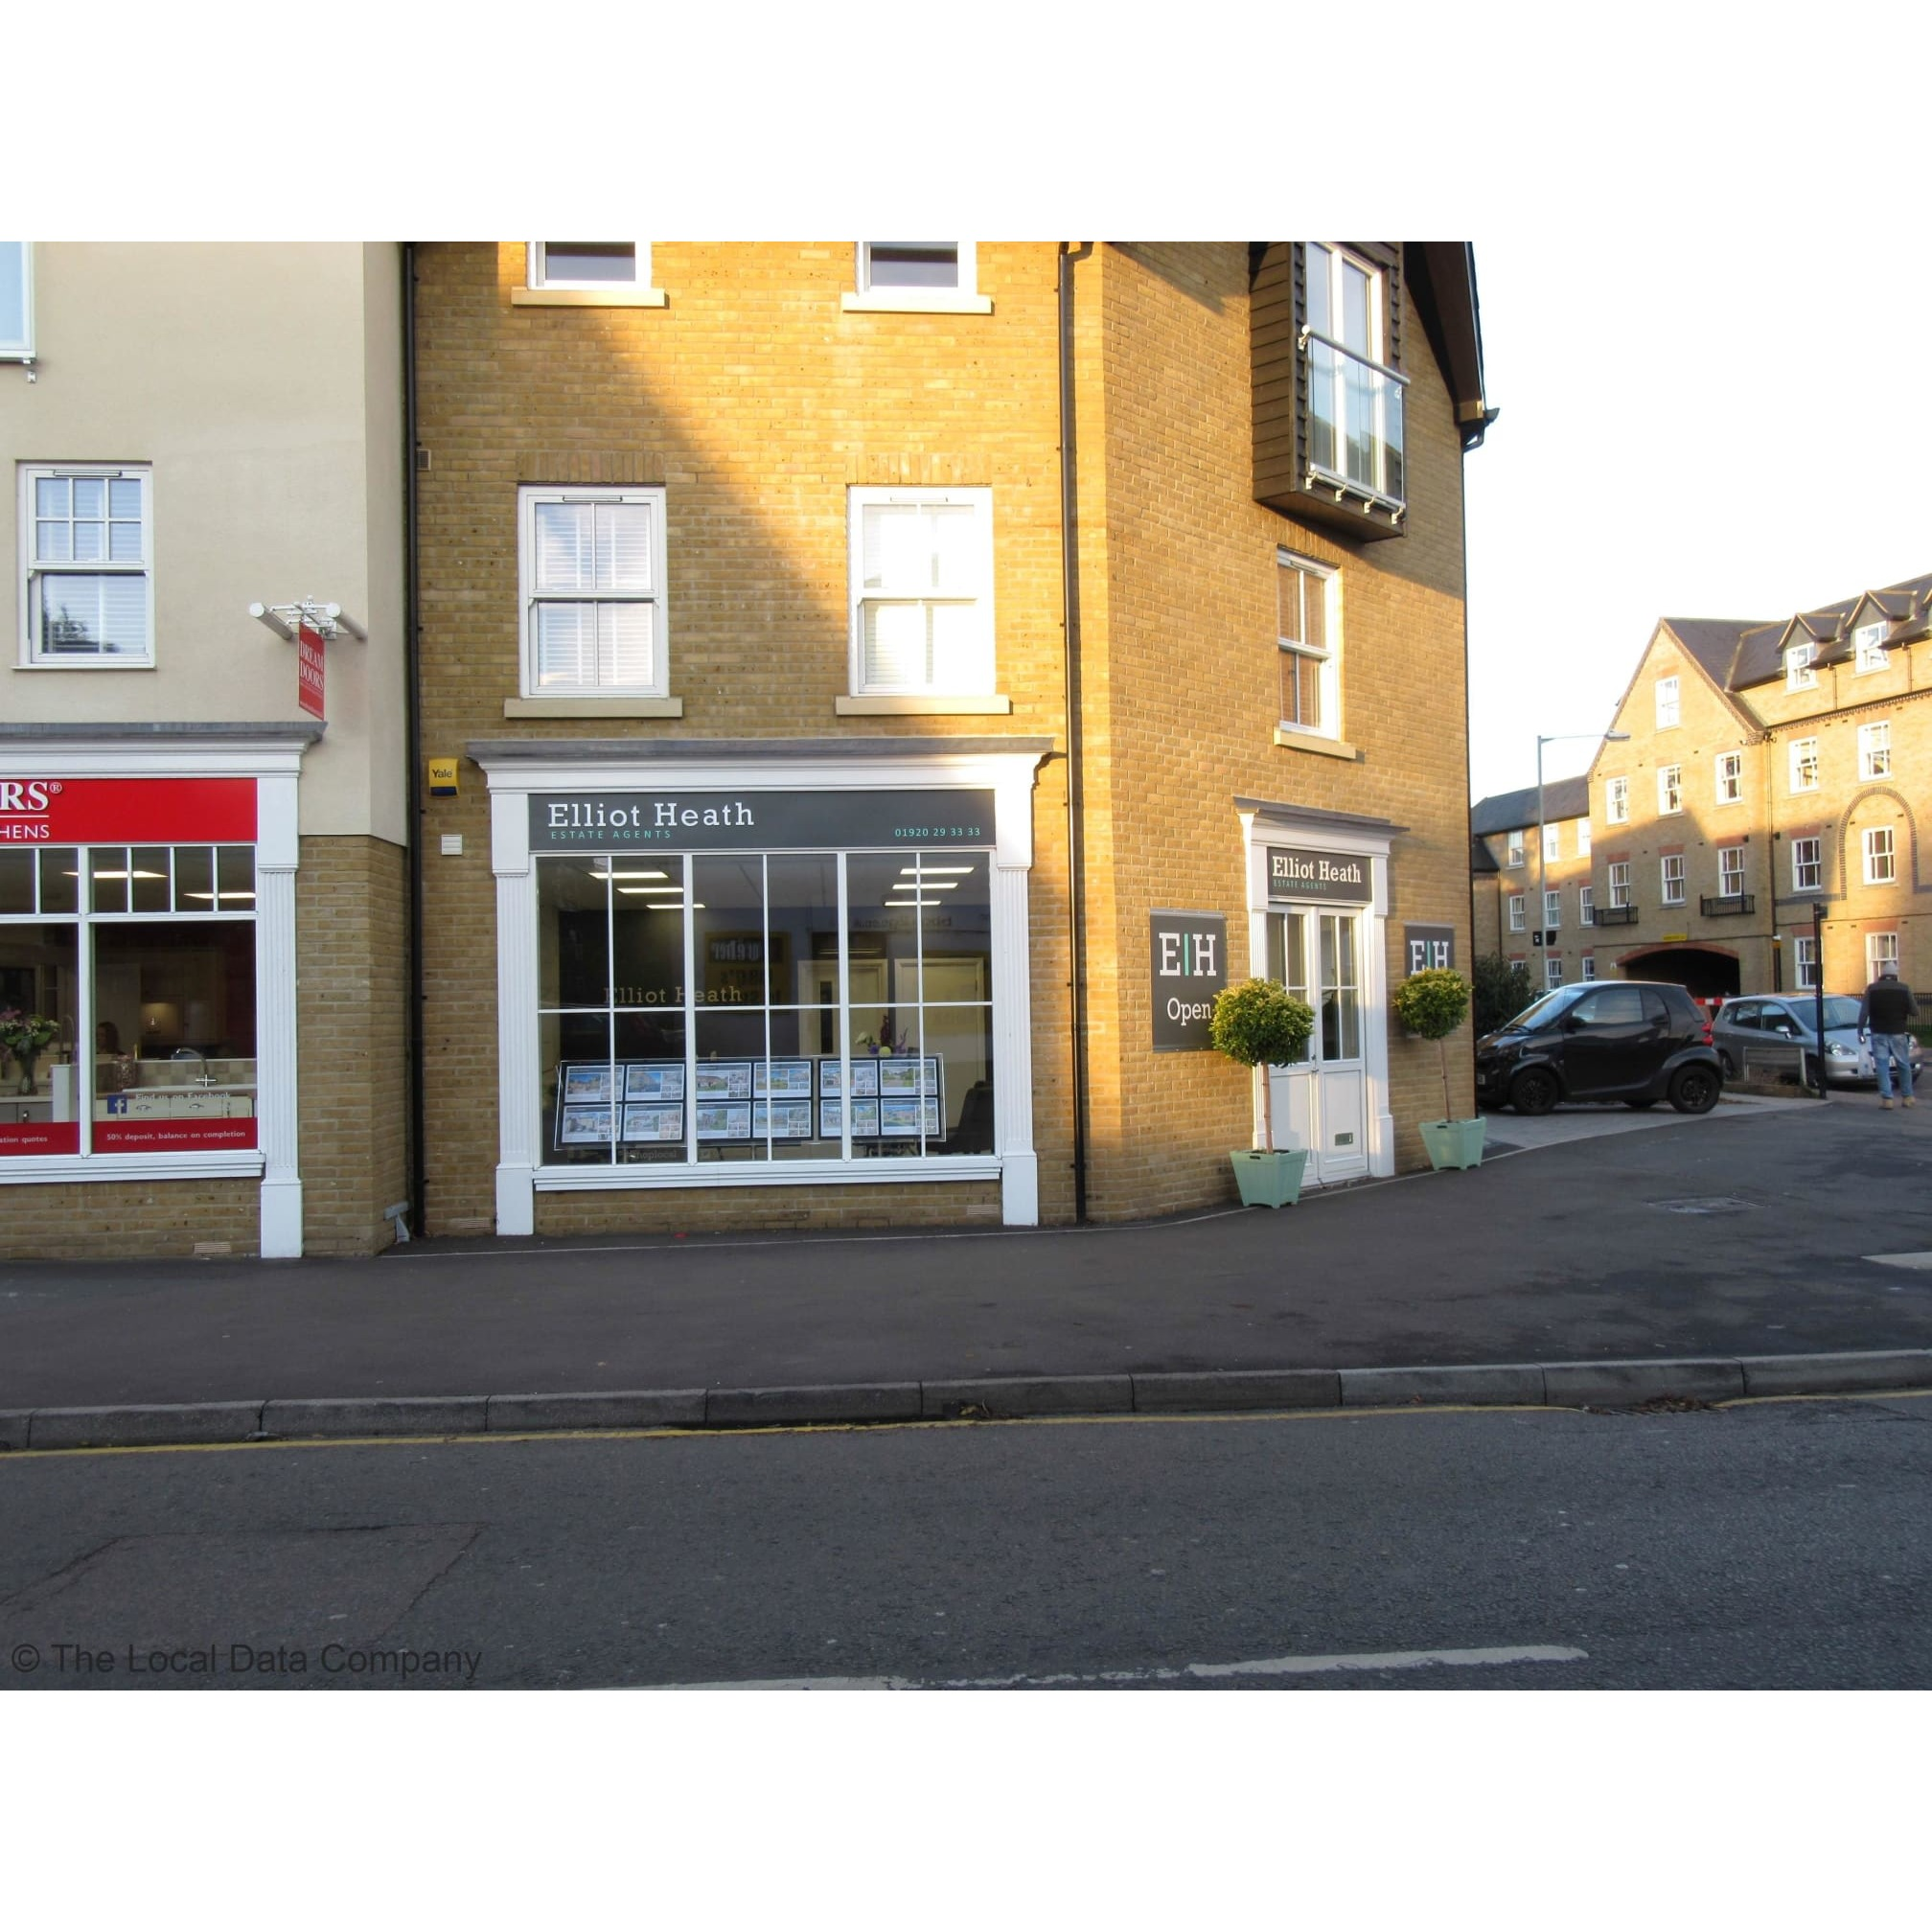 Elliot Heath Estate Agents - Ware, Hertfordshire SG12 7AA - 01920 293333 | ShowMeLocal.com